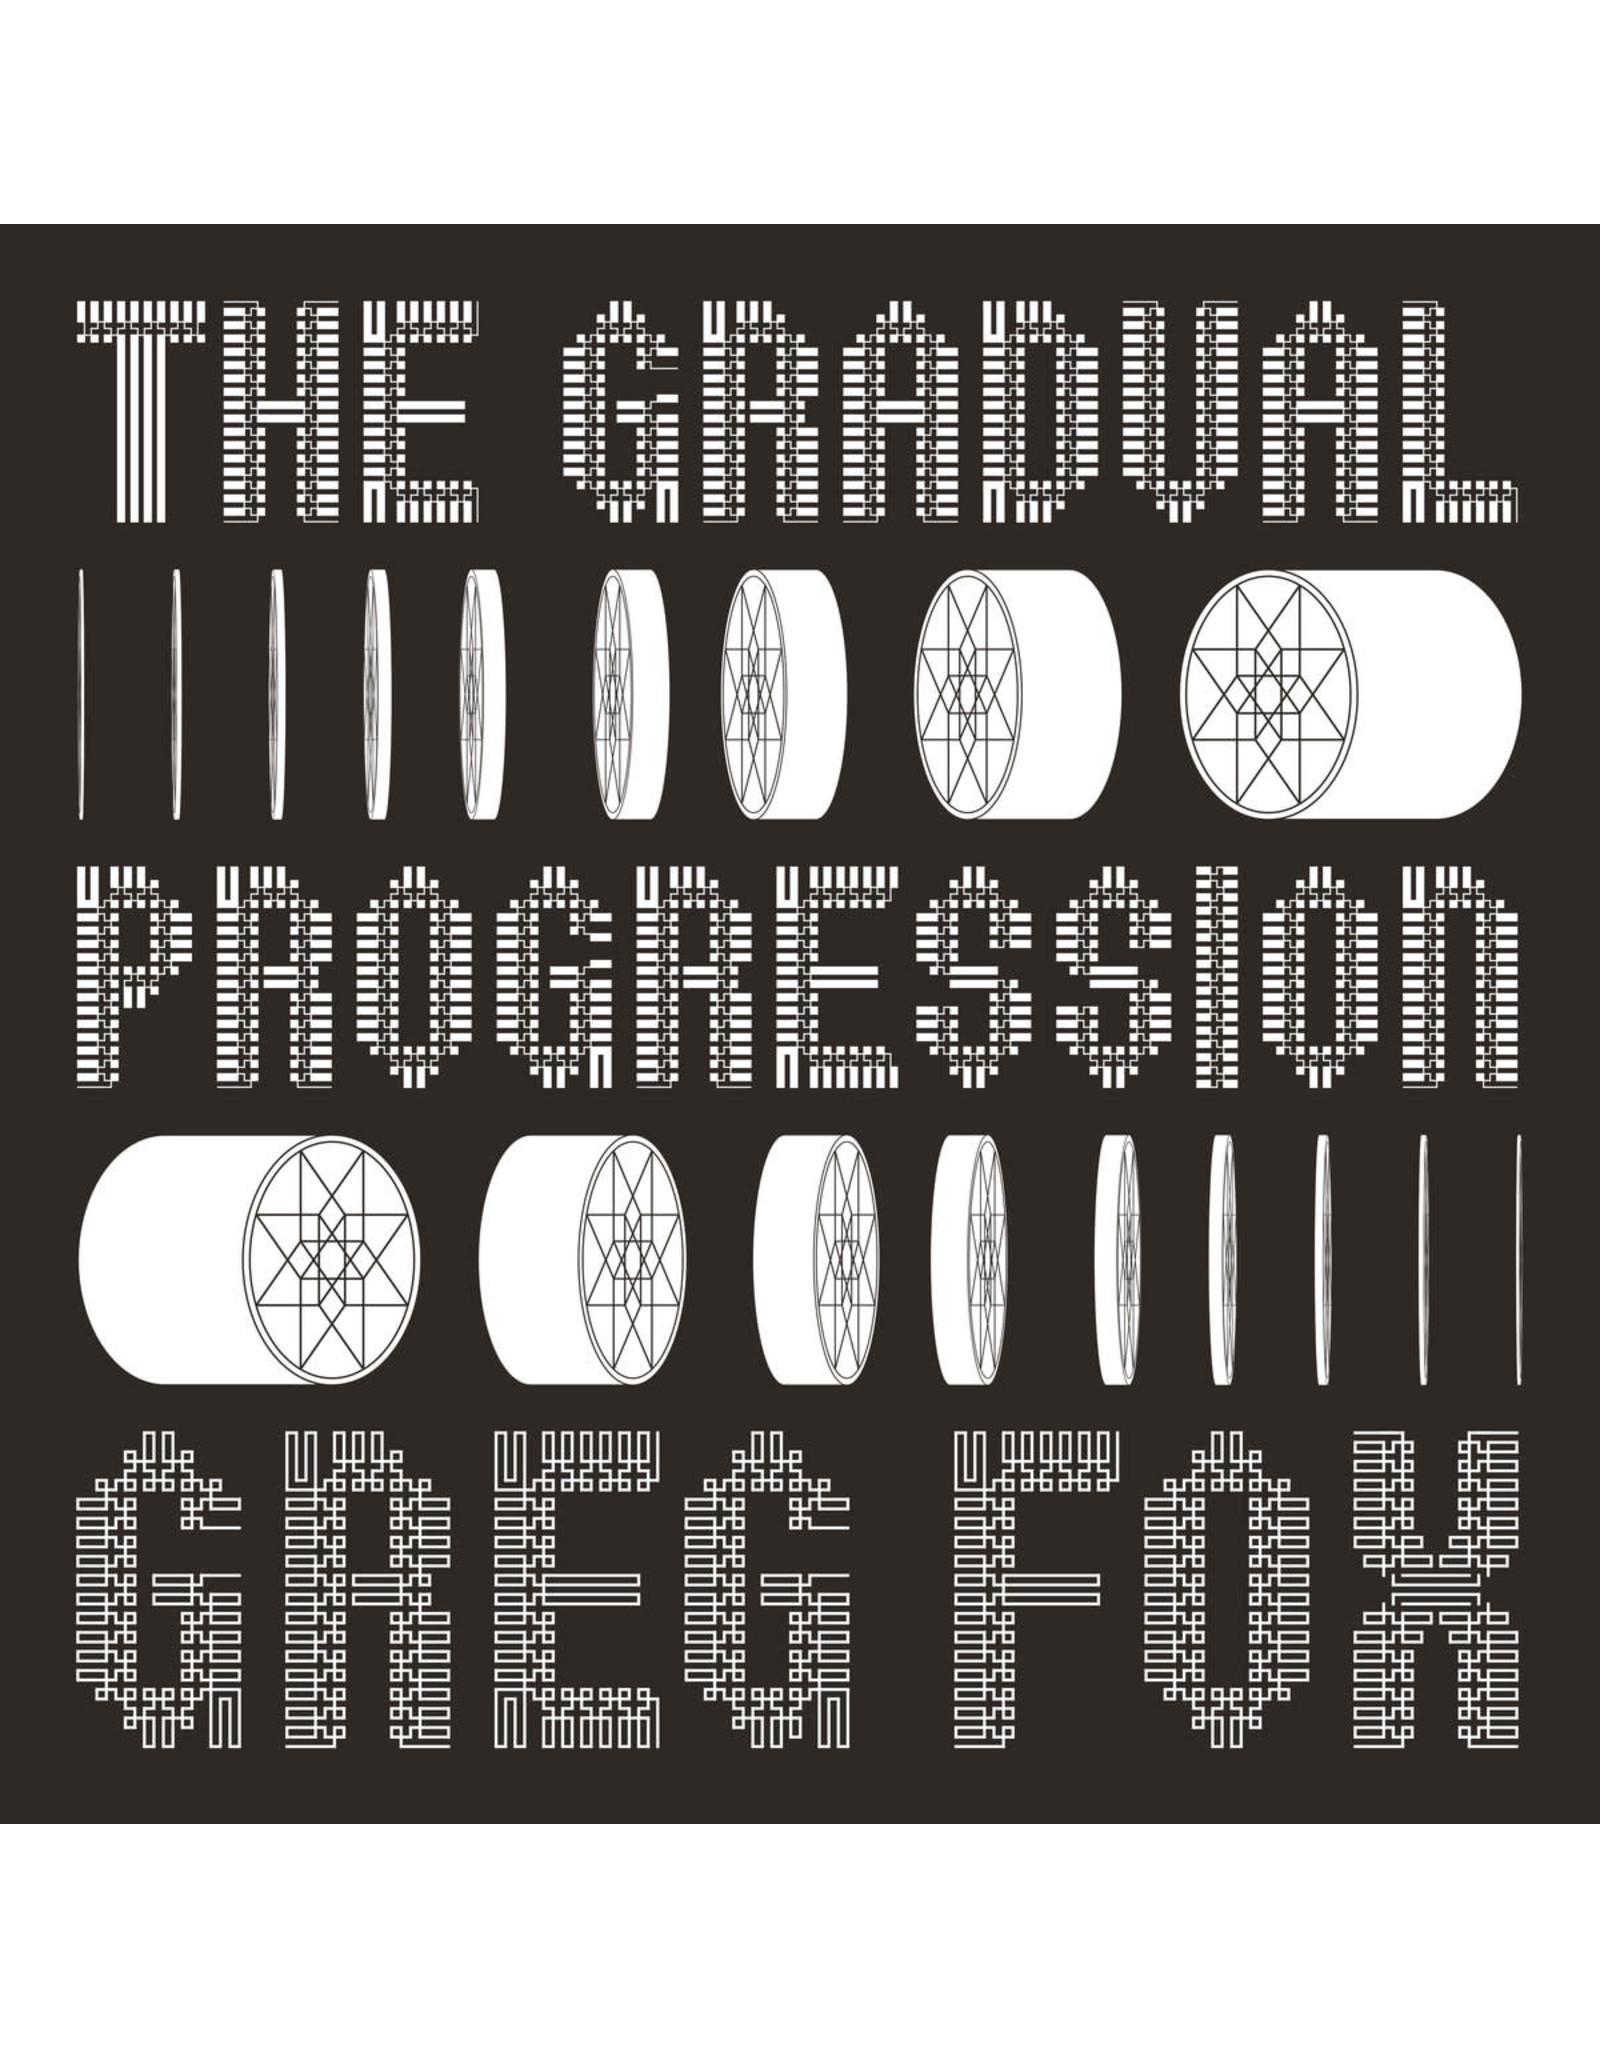 Greg Fox - Gradual Progression